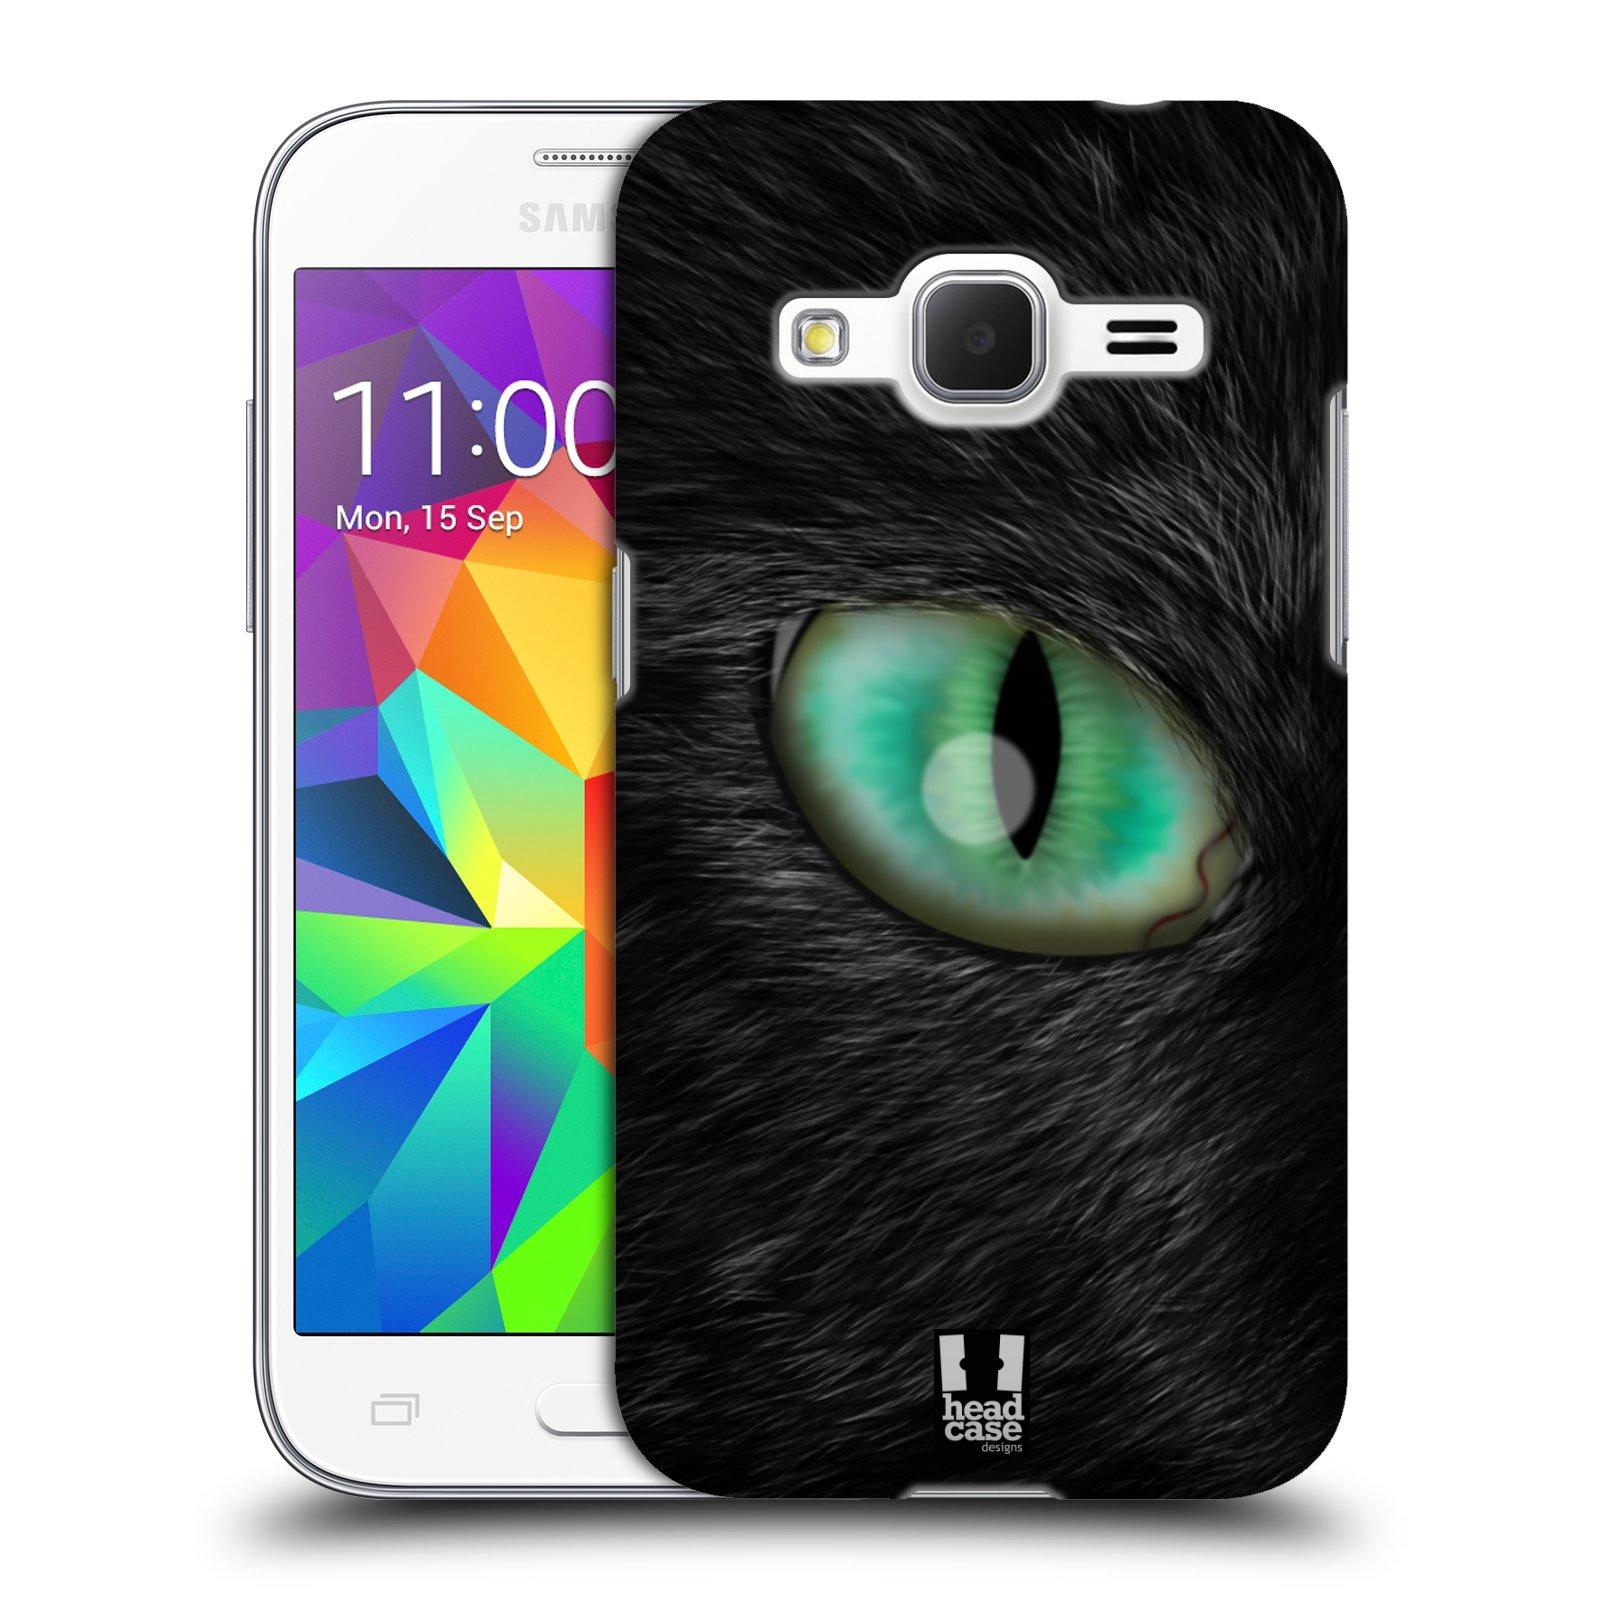 HEAD CASE plastový obal na mobil SAMSUNG GALAXY Core Prime (Core Prime VE) vzor pohled zvířete oko kočka